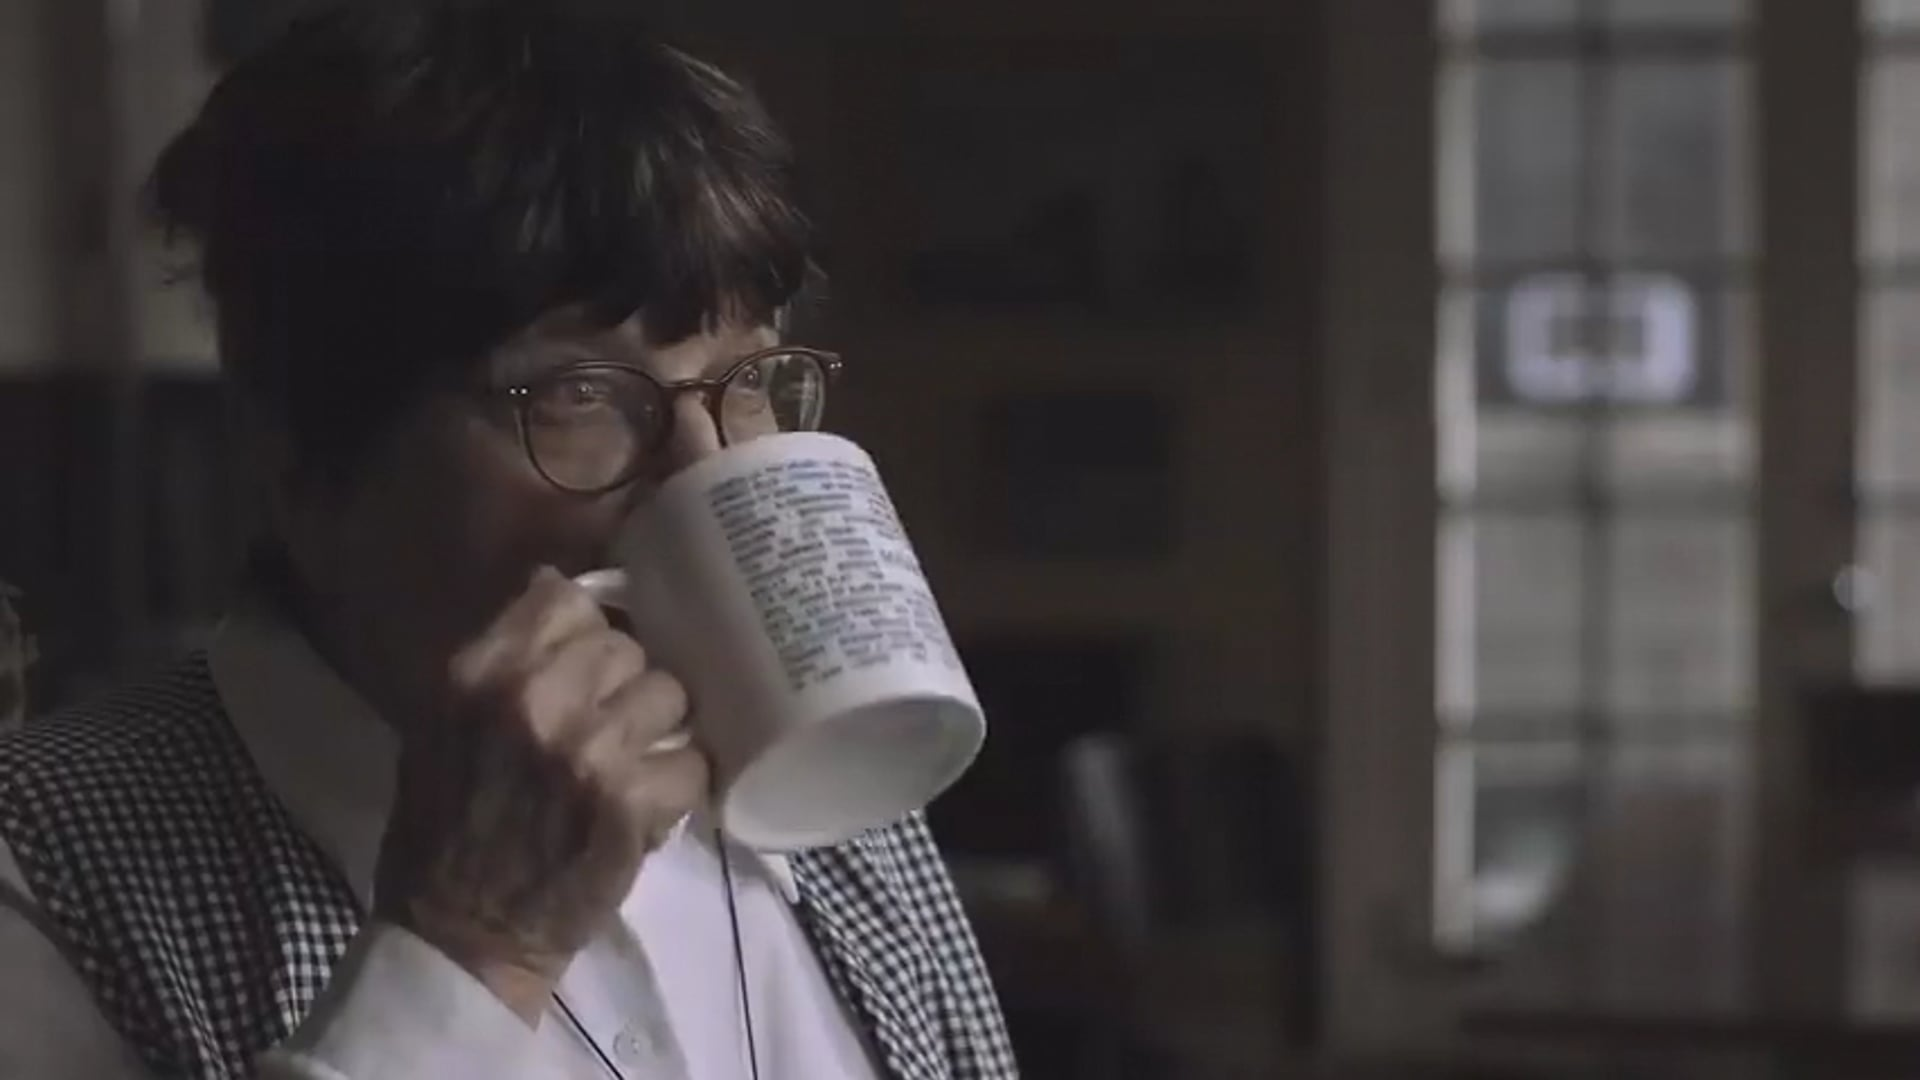 Sister - PBS (Documentary)